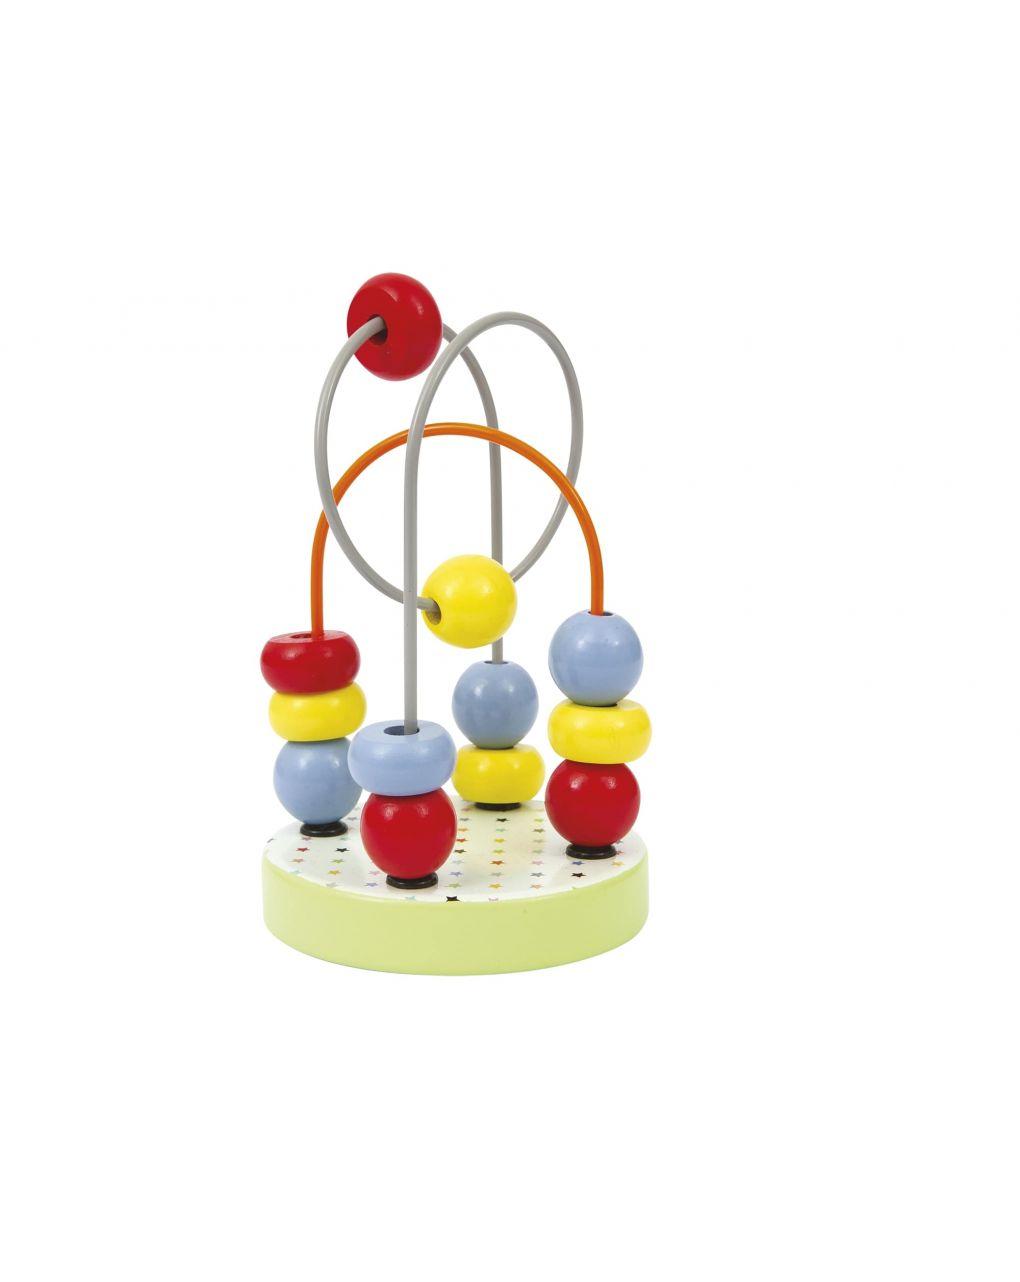 Wood'n'play - mini labirinto - Wood'N'Play